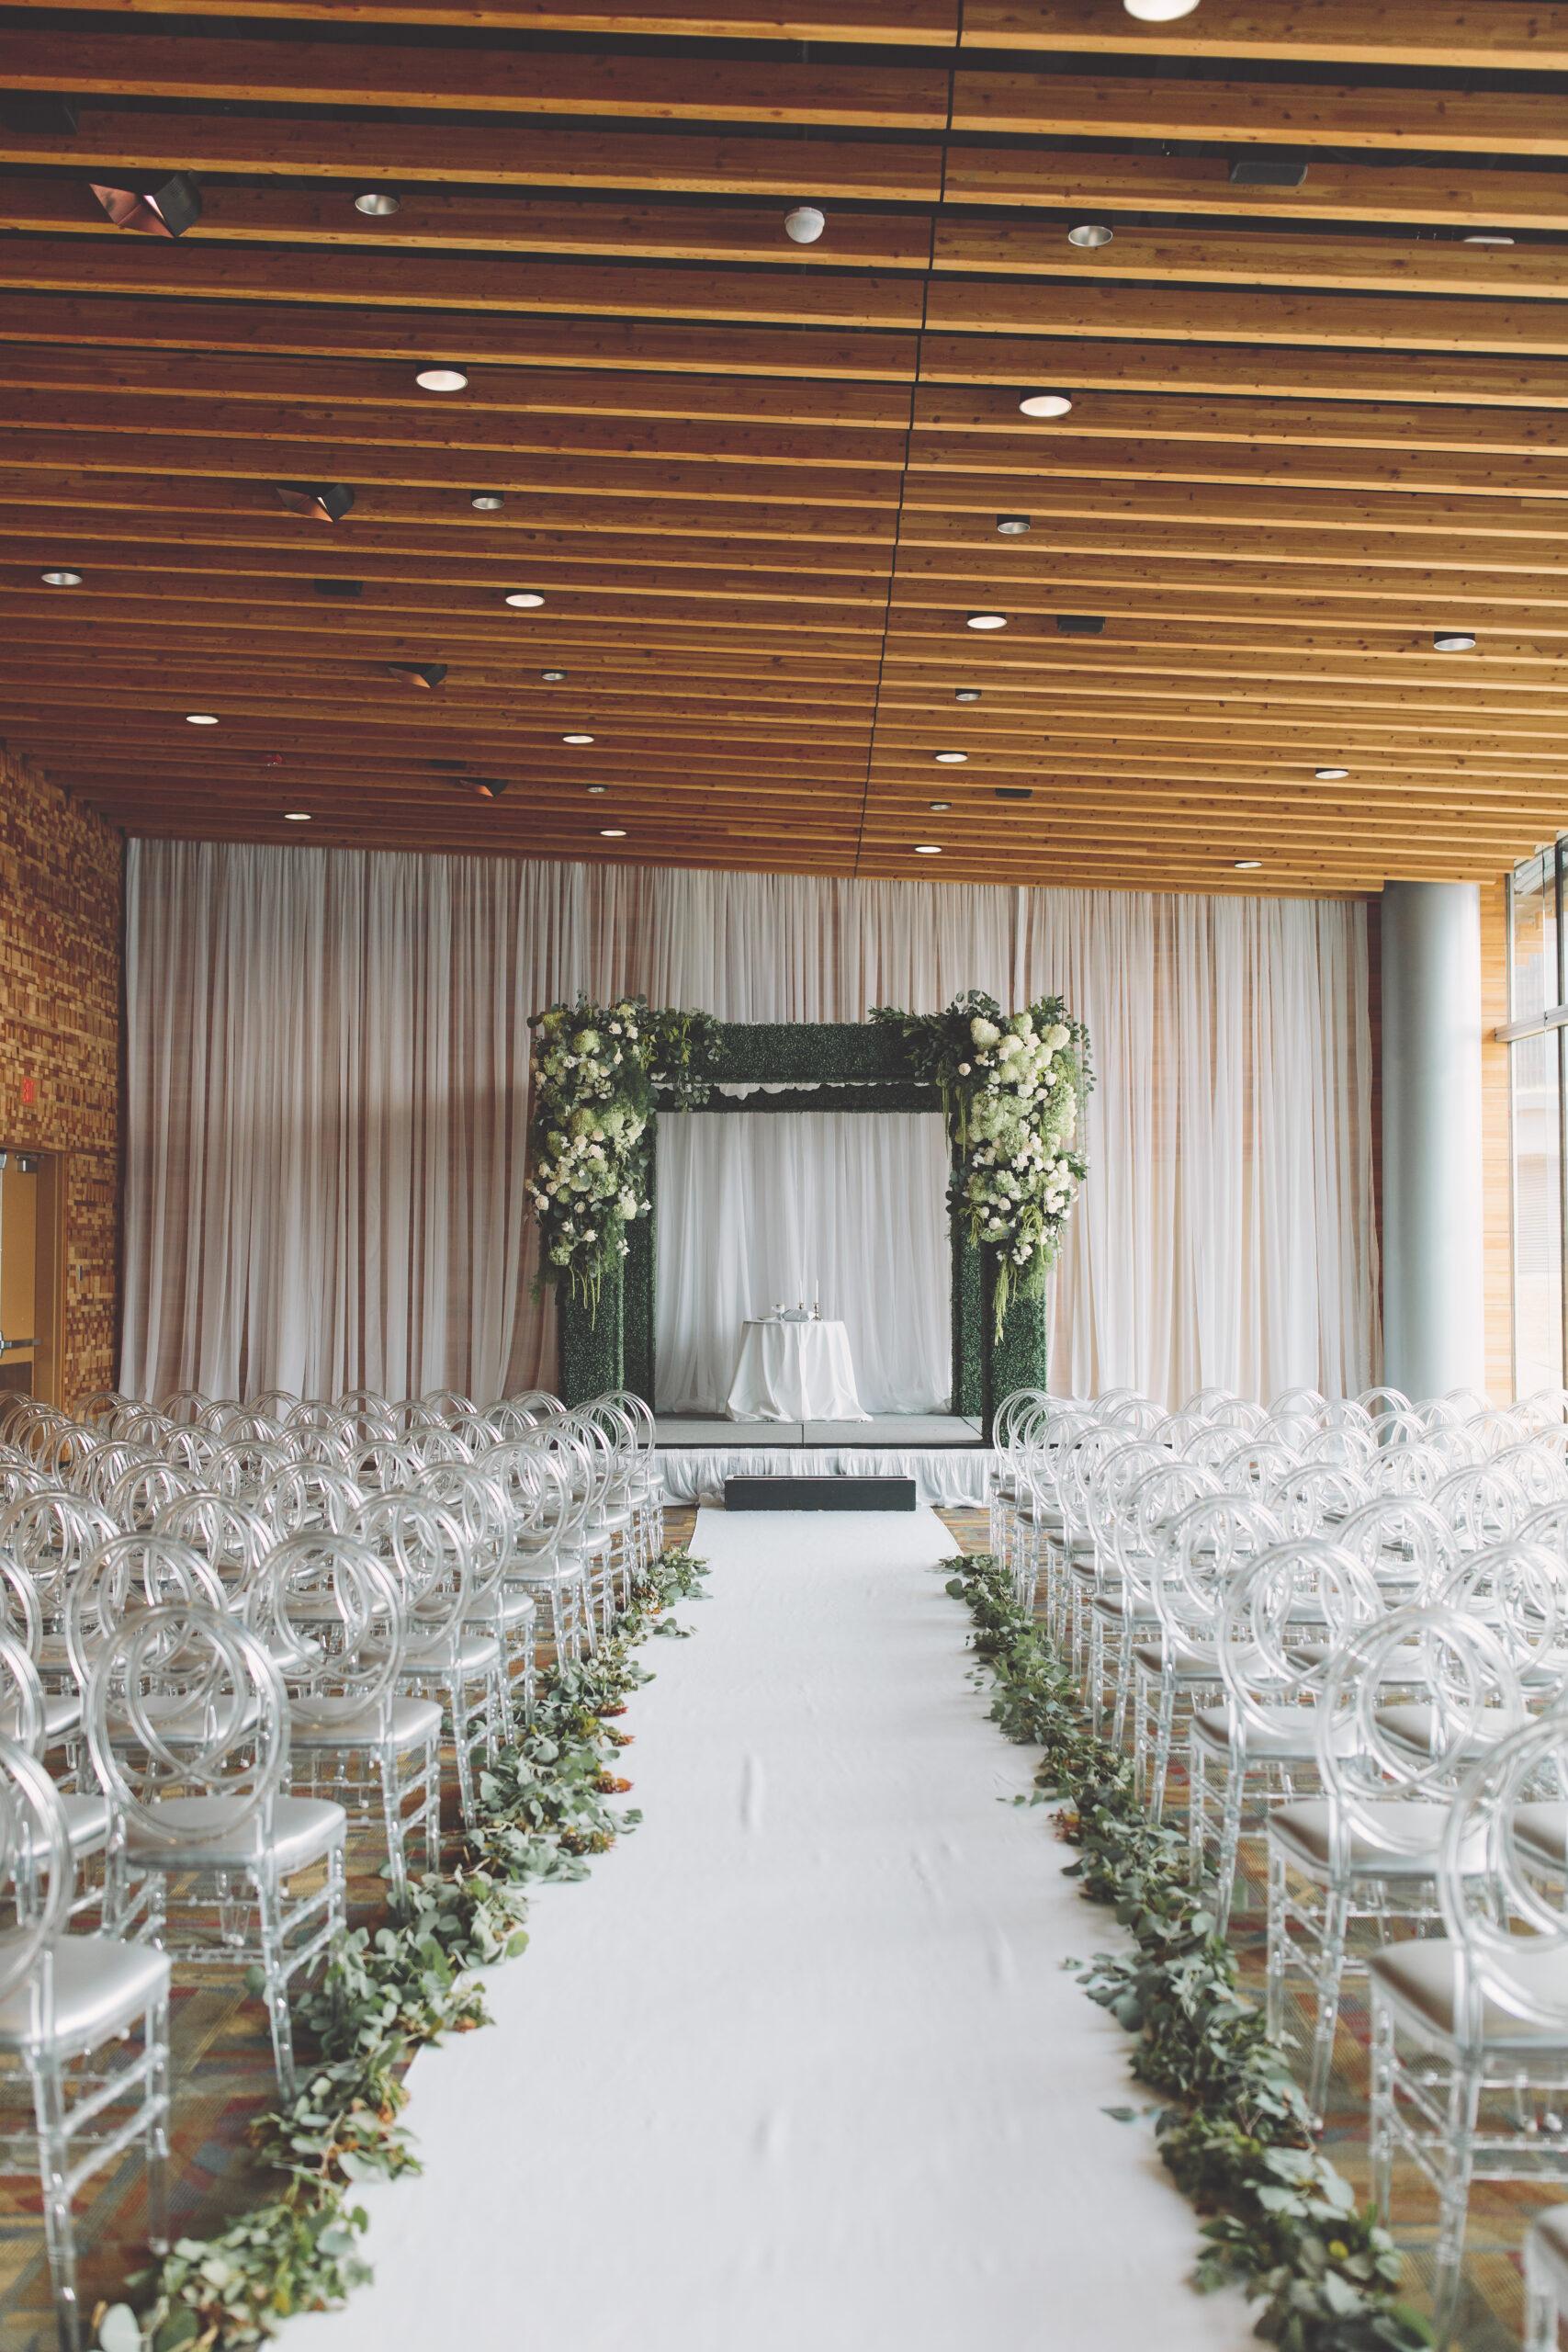 https://secureservercdn.net/45.40.145.151/kgq.ab5.myftpupload.com/wp-content/uploads/2020/04/Amanda-Daniel-Wedding-0393-scaled.jpg?time=1620836143